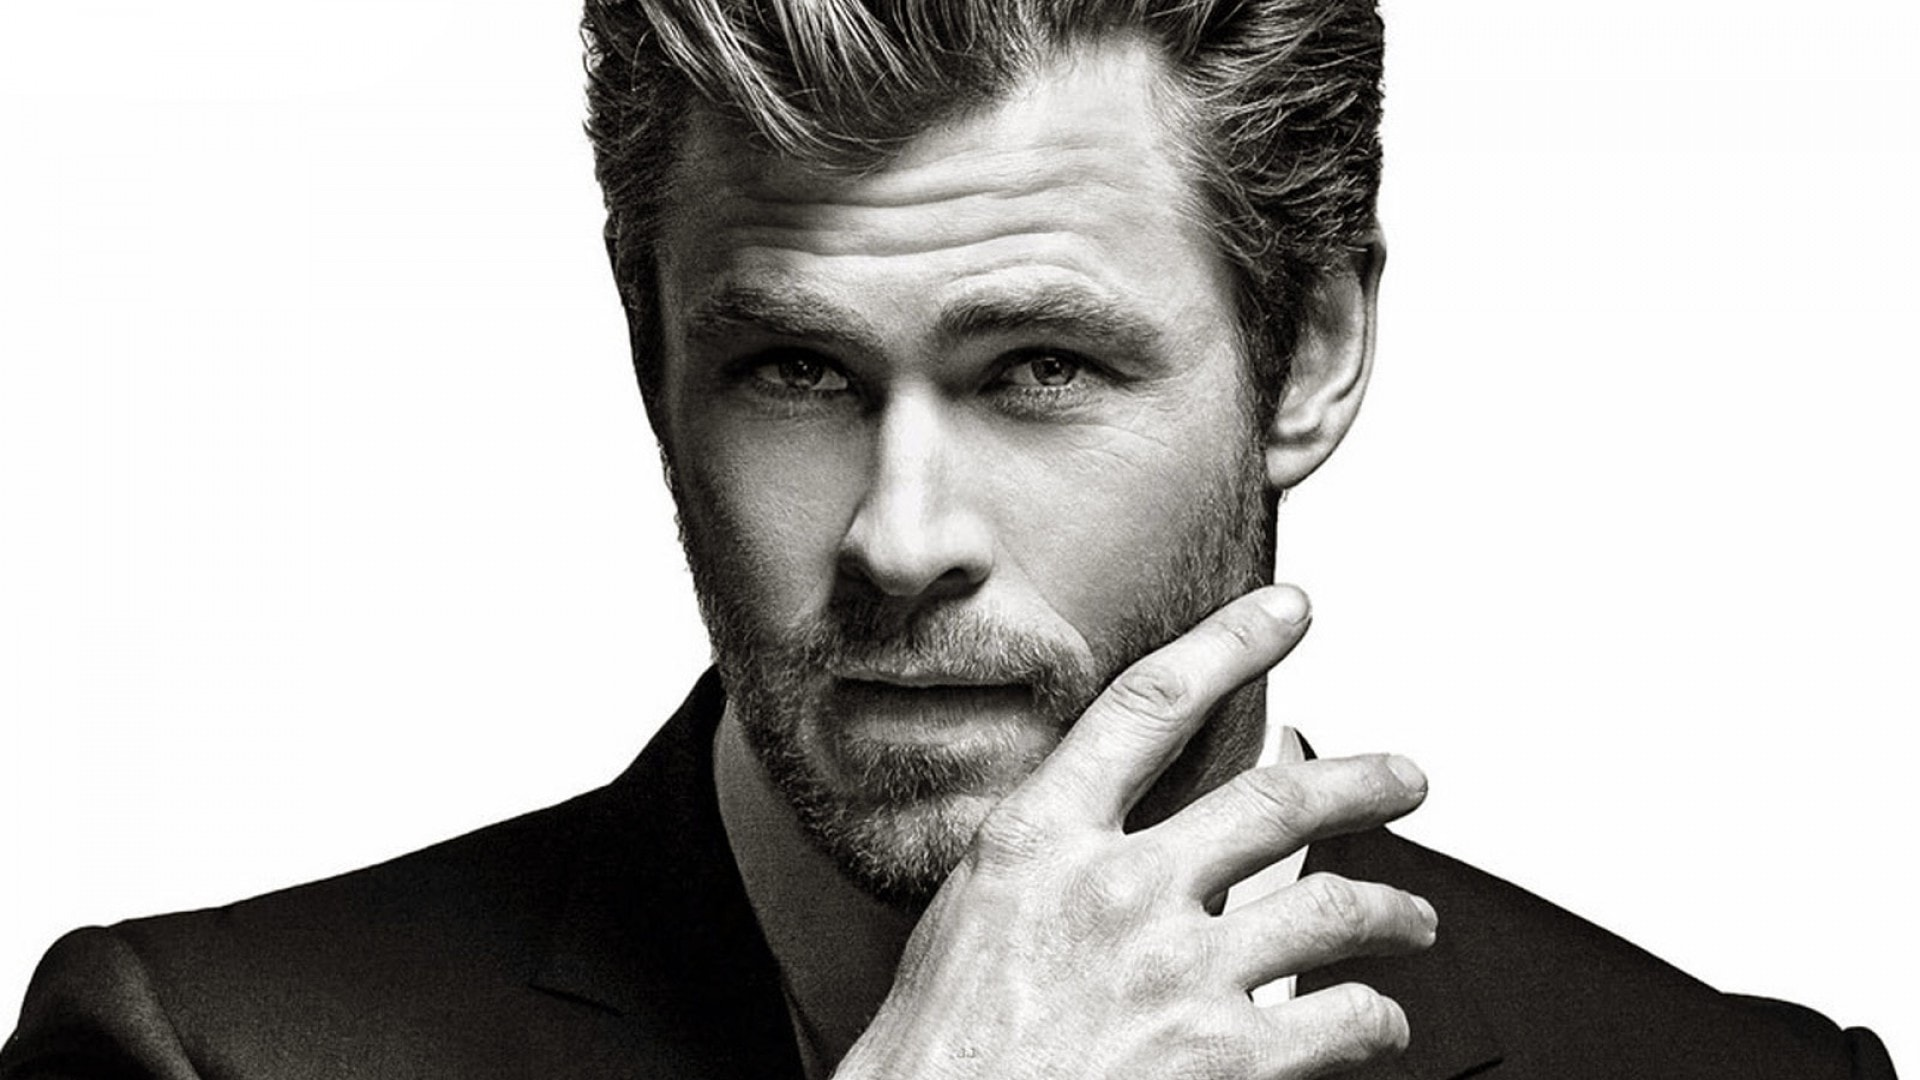 Chris Hemsworth Wallpapers hd